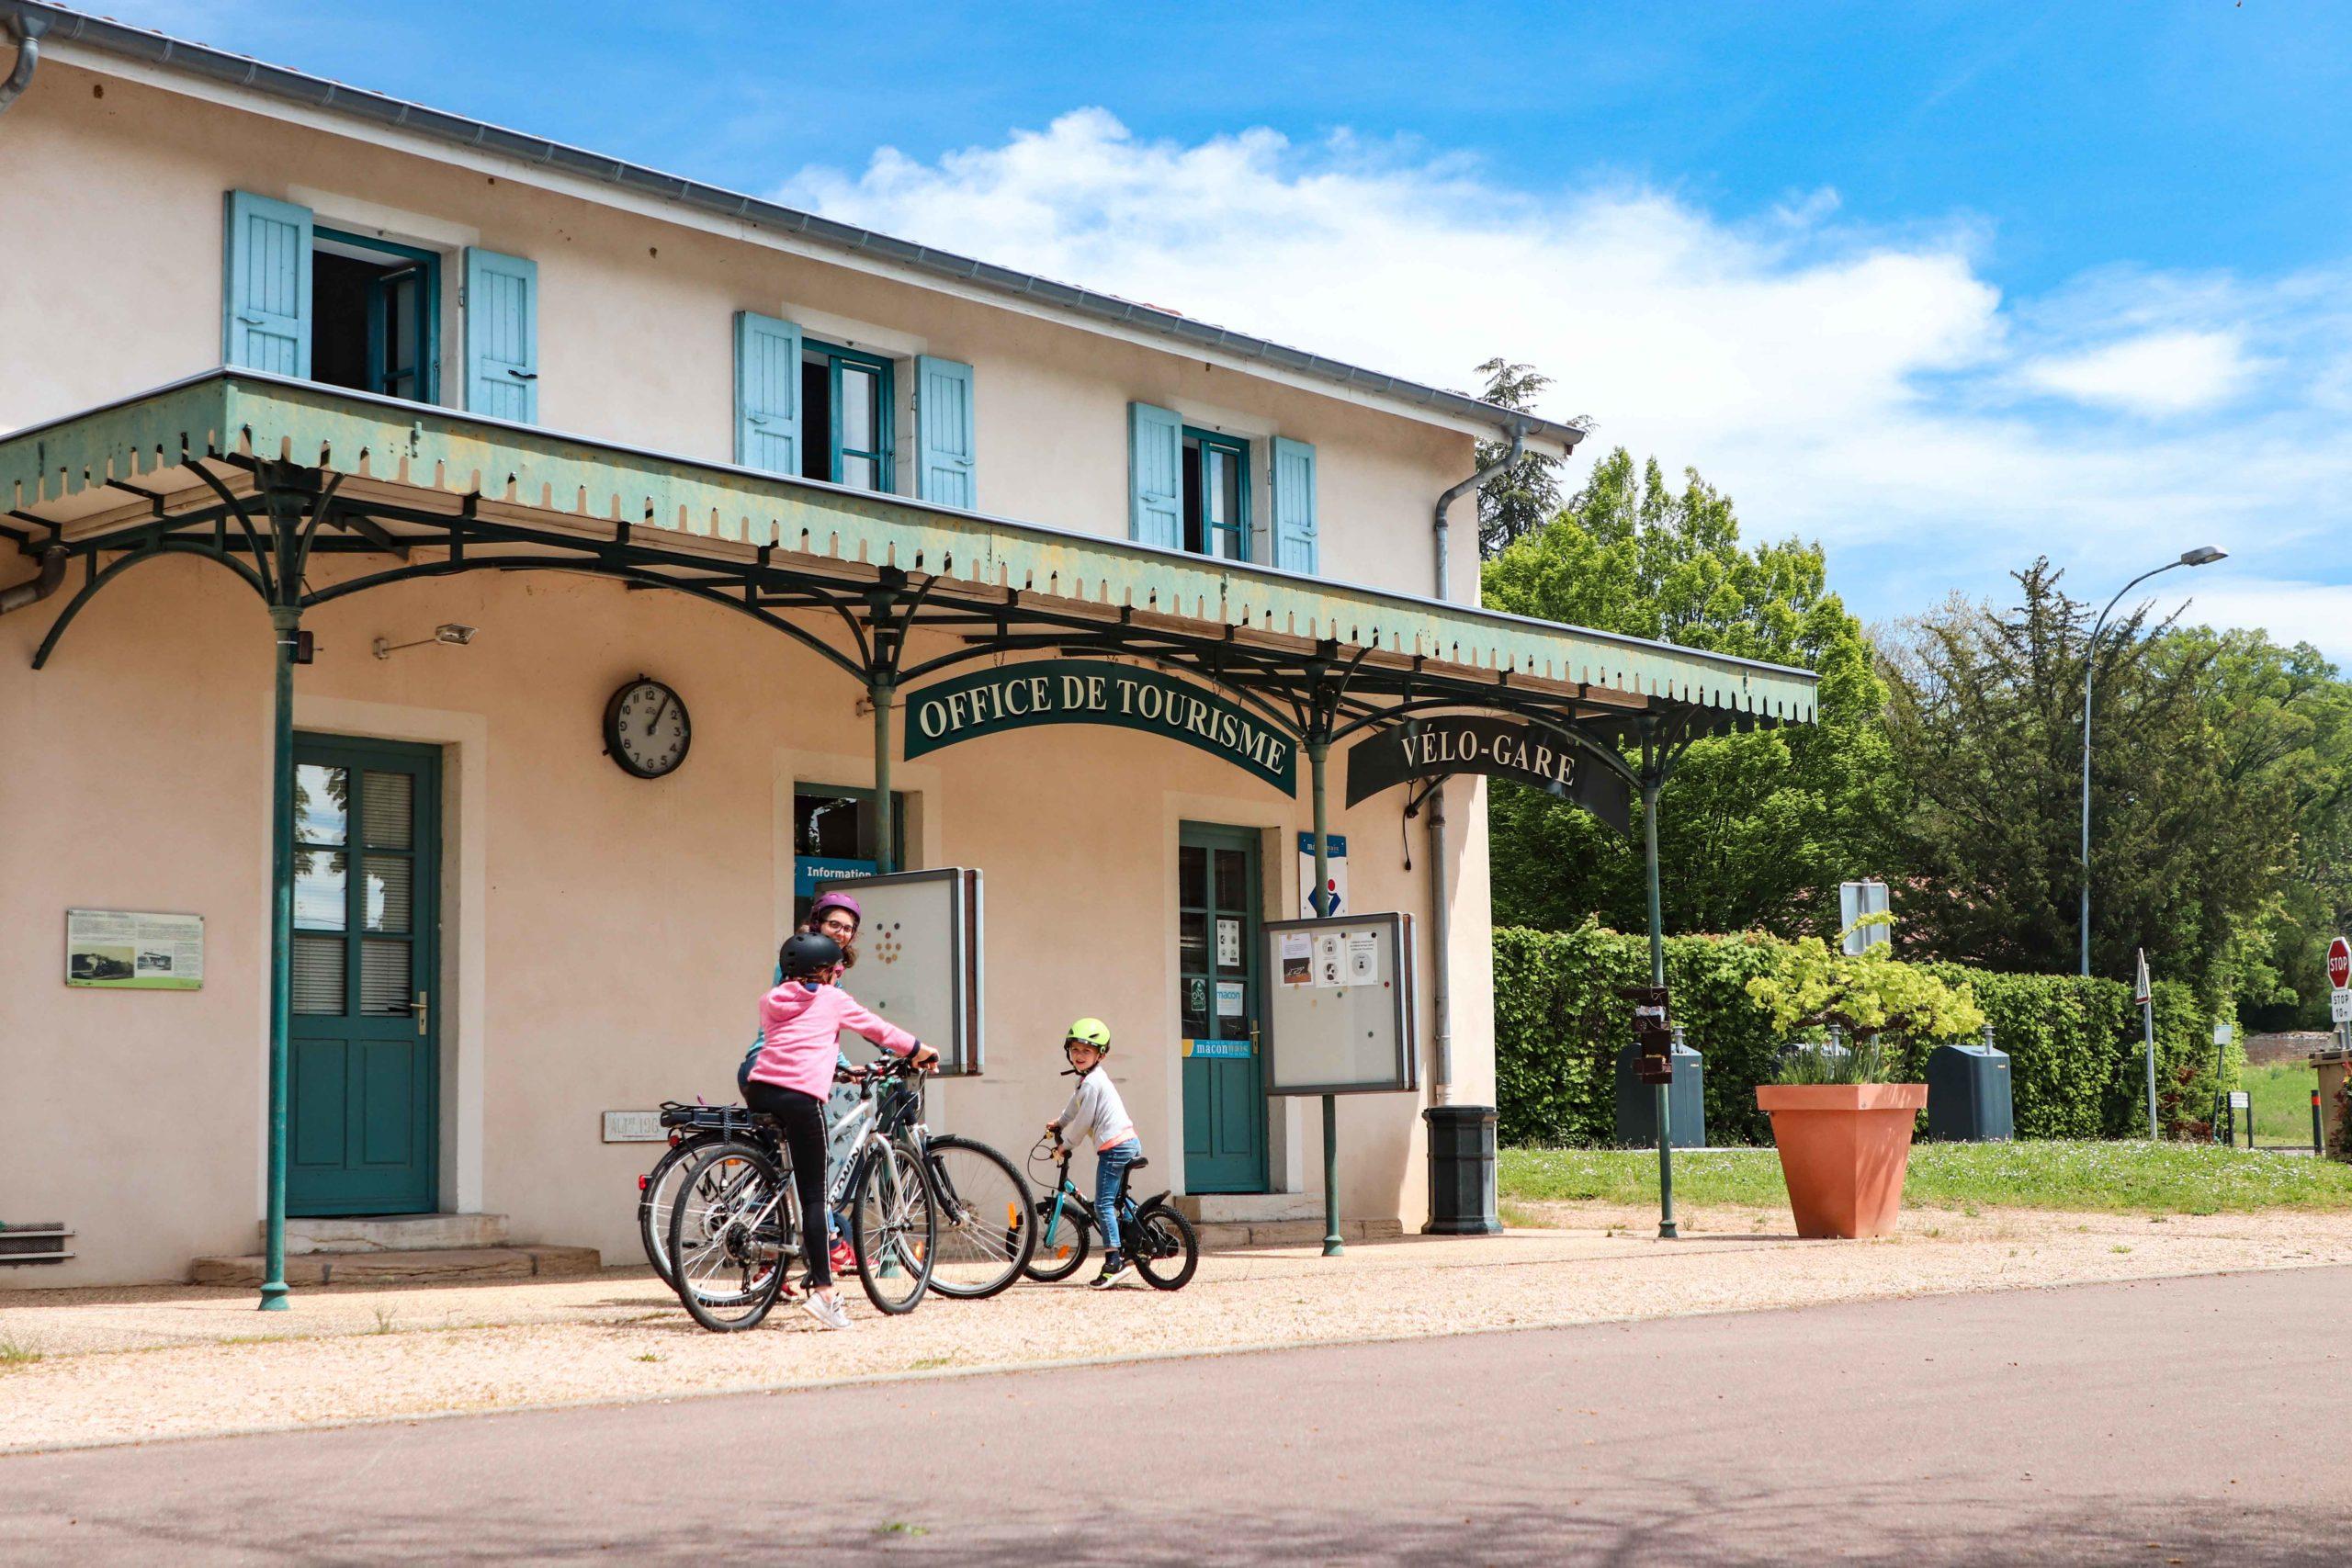 Charnay-lès-Macon - Vélo gare - vélo famille - Saône-et-Loire